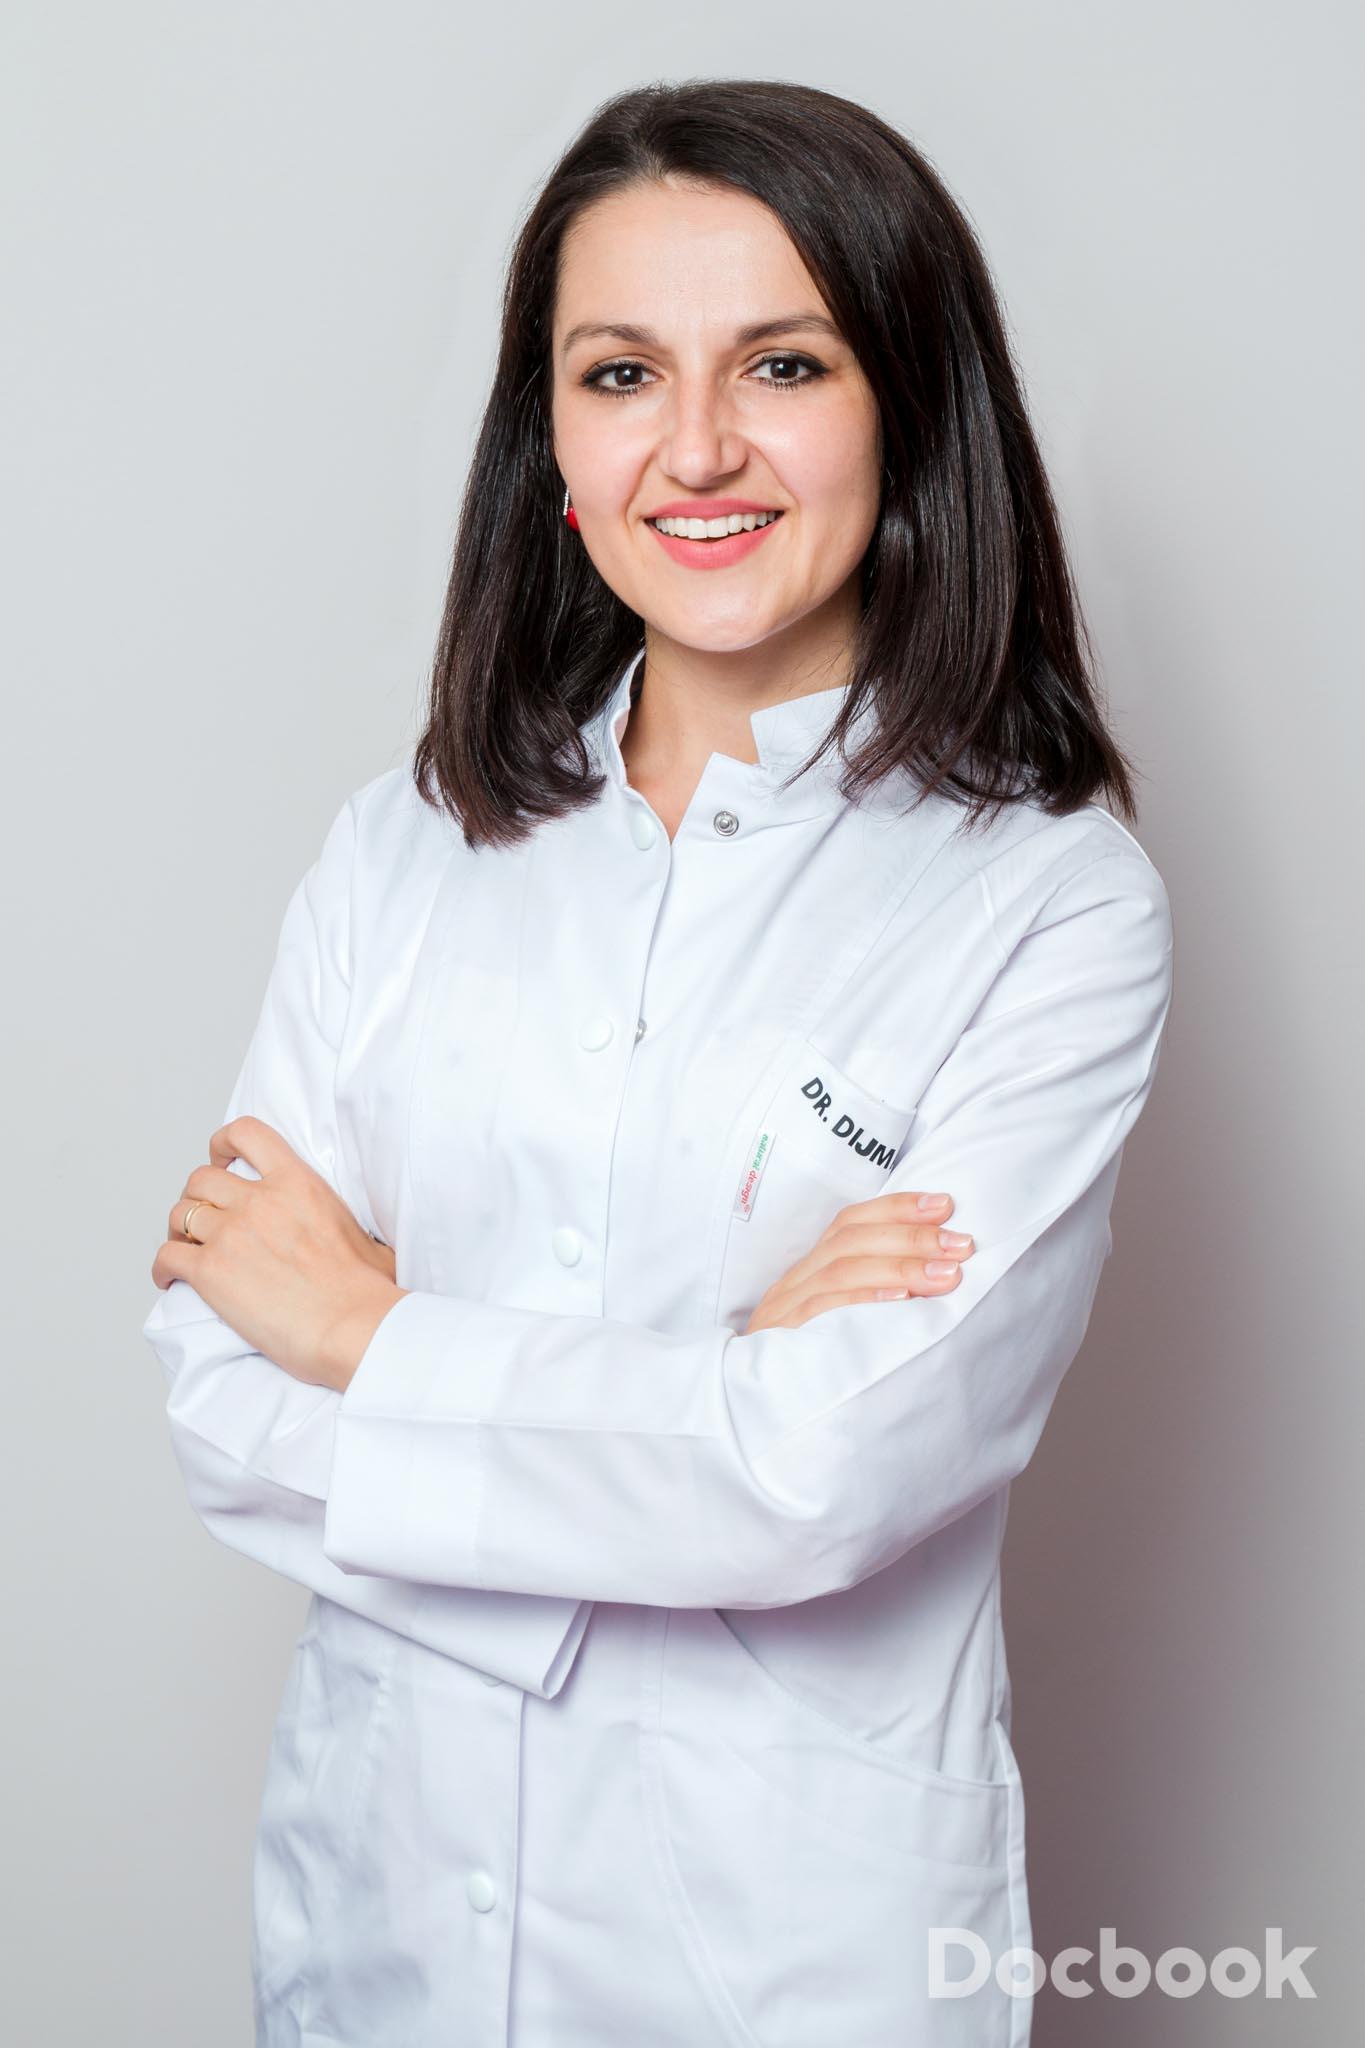 Dr. Dijmarescu Codruta